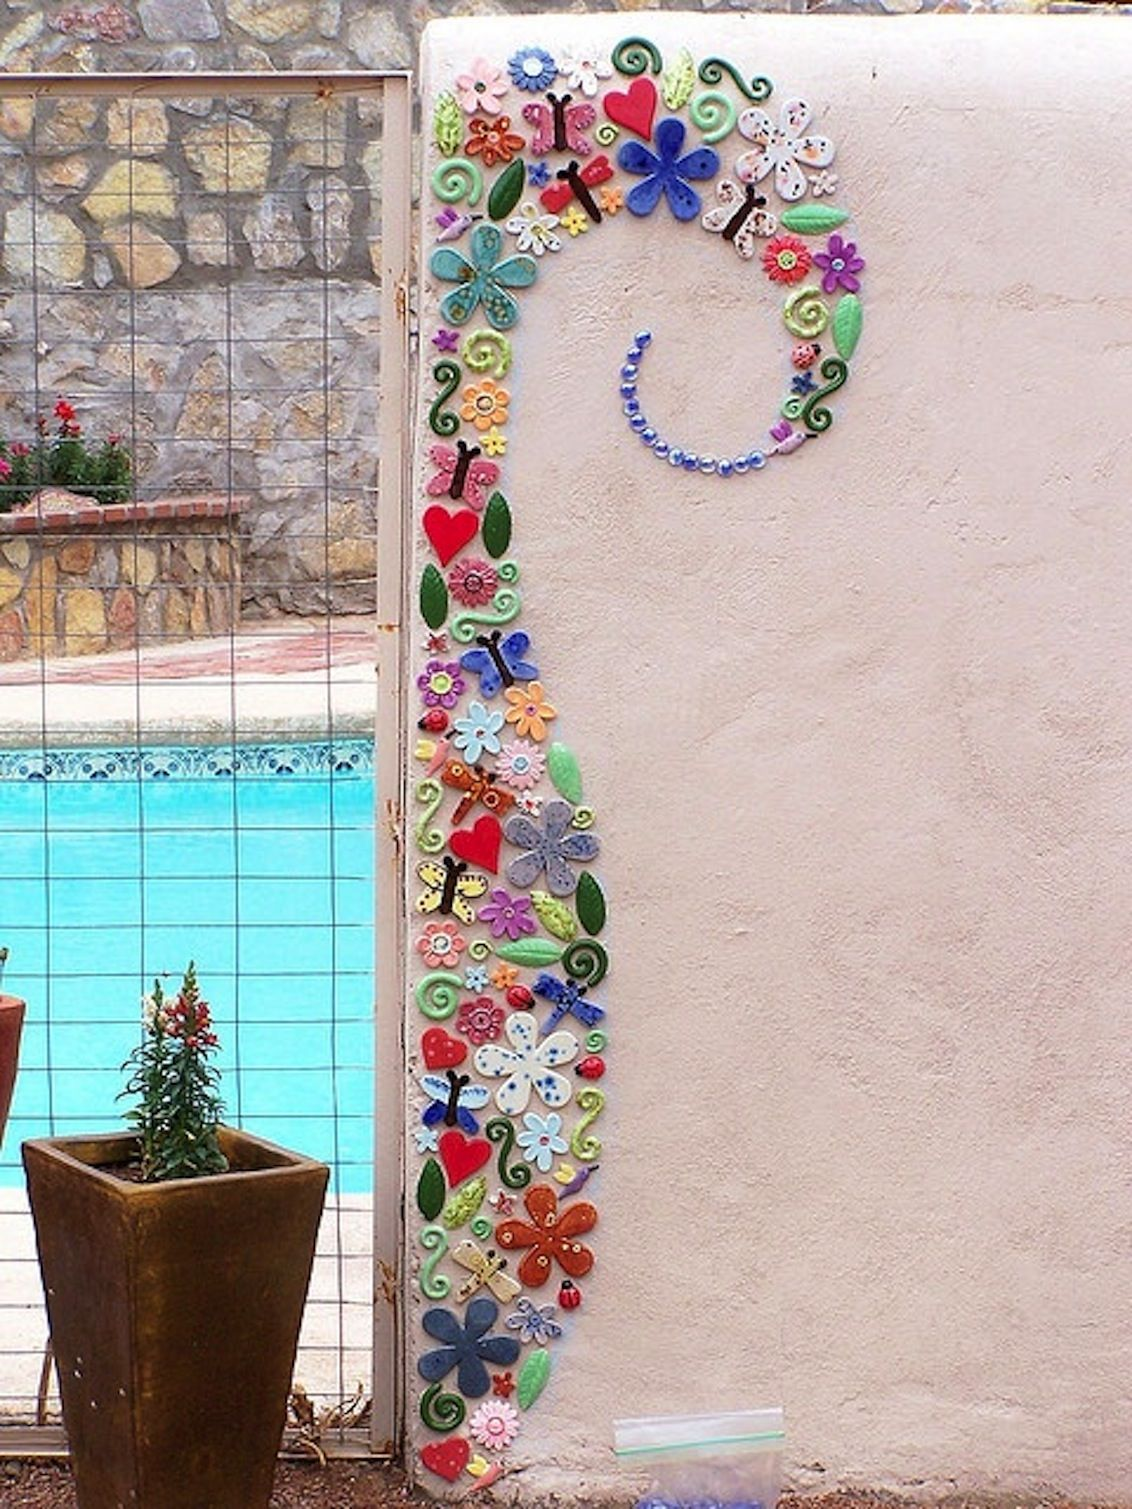 Decorative wall mosaic pinterest decorative walls walls and